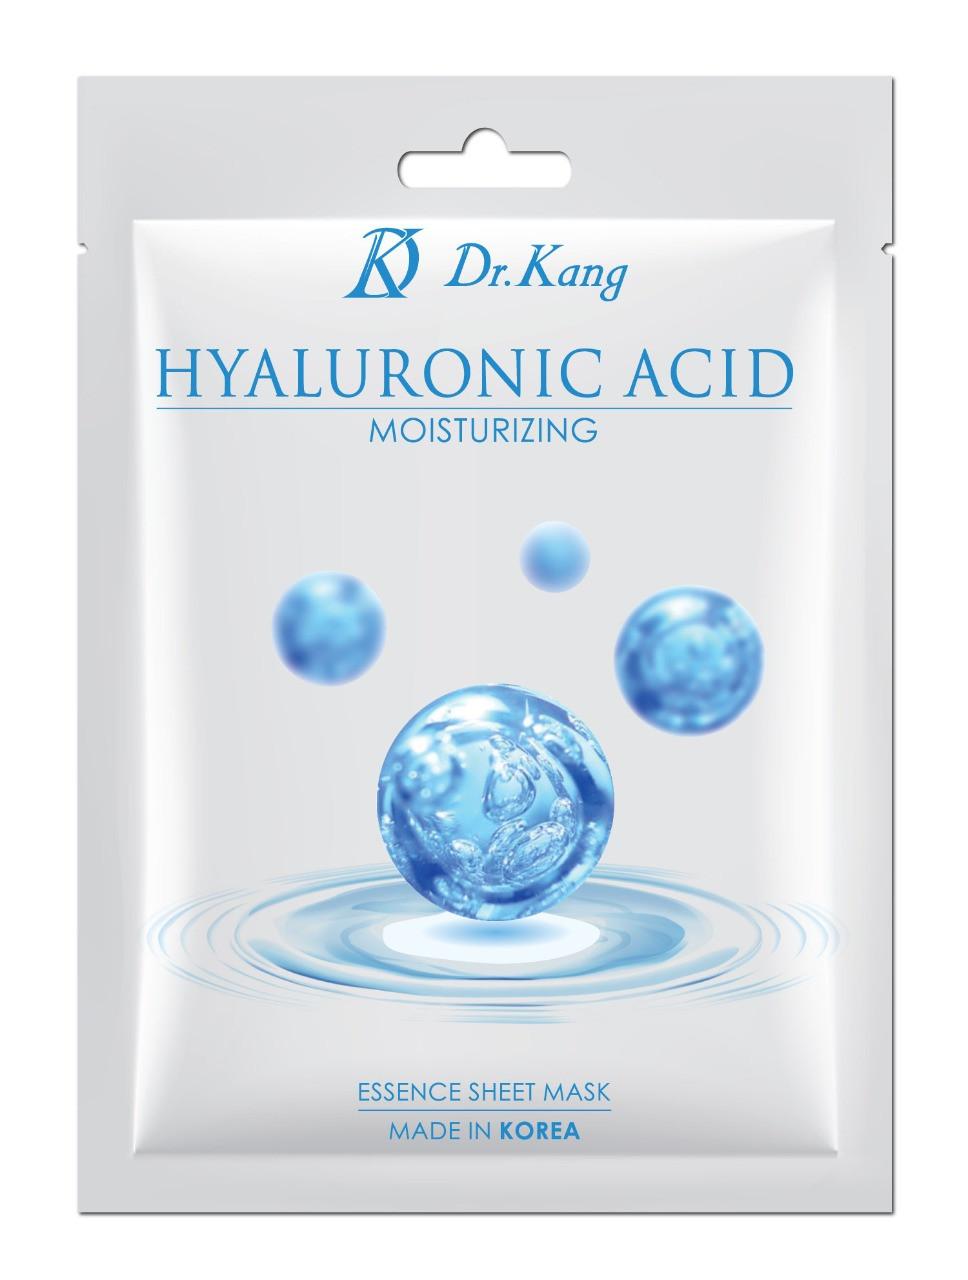 Dr.Kang Тканевая маска с гиалуроновой кислотой Hyaluronic Acid Essence Sheet Mask / Moisturizing